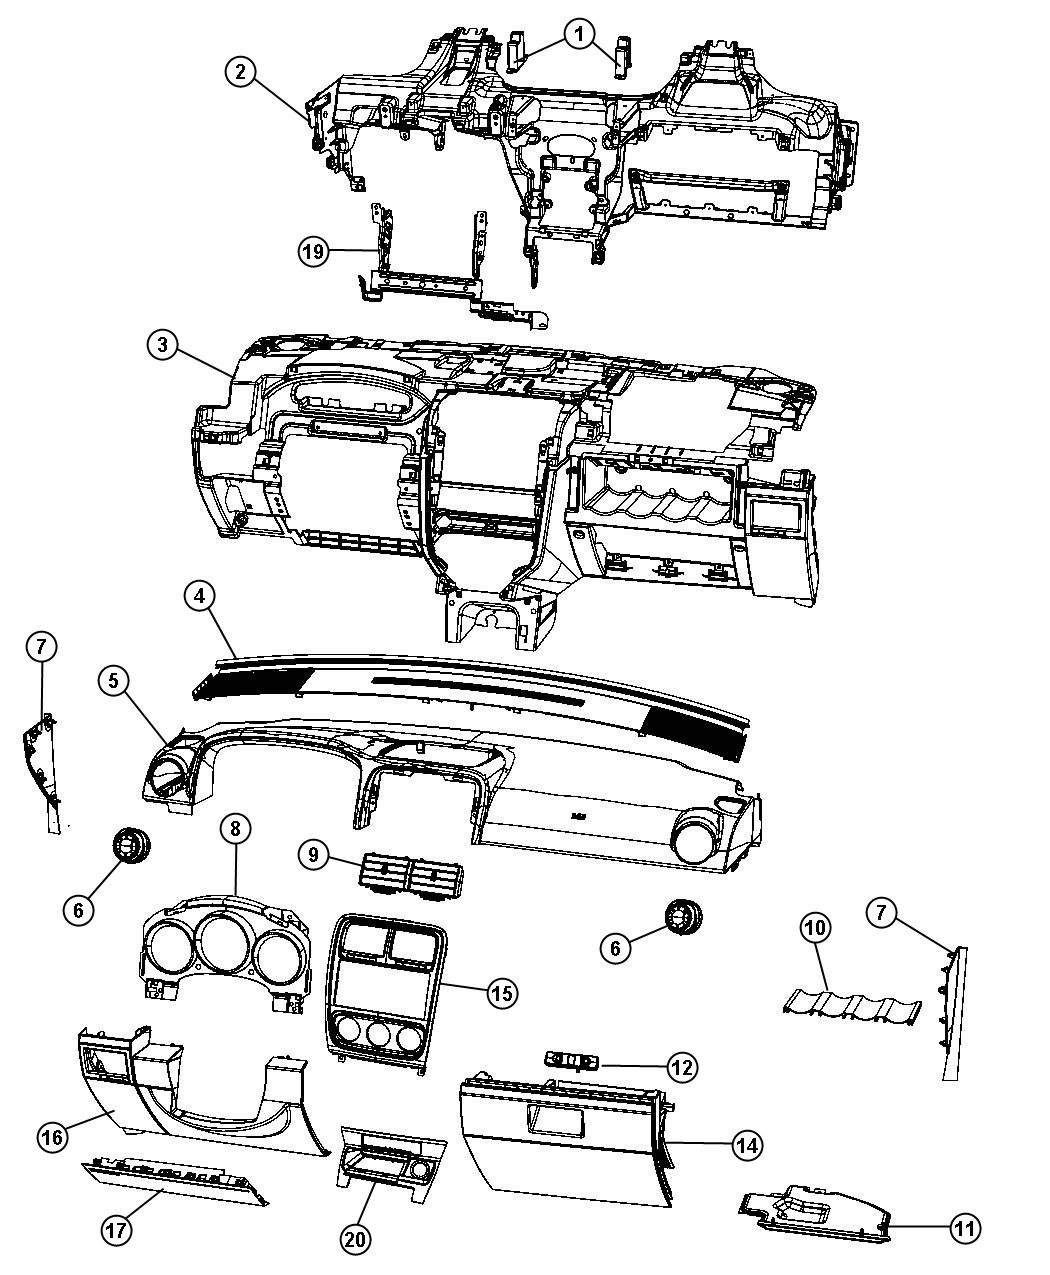 2011 Dodge Caliber Striker. Glove box door latch. [air